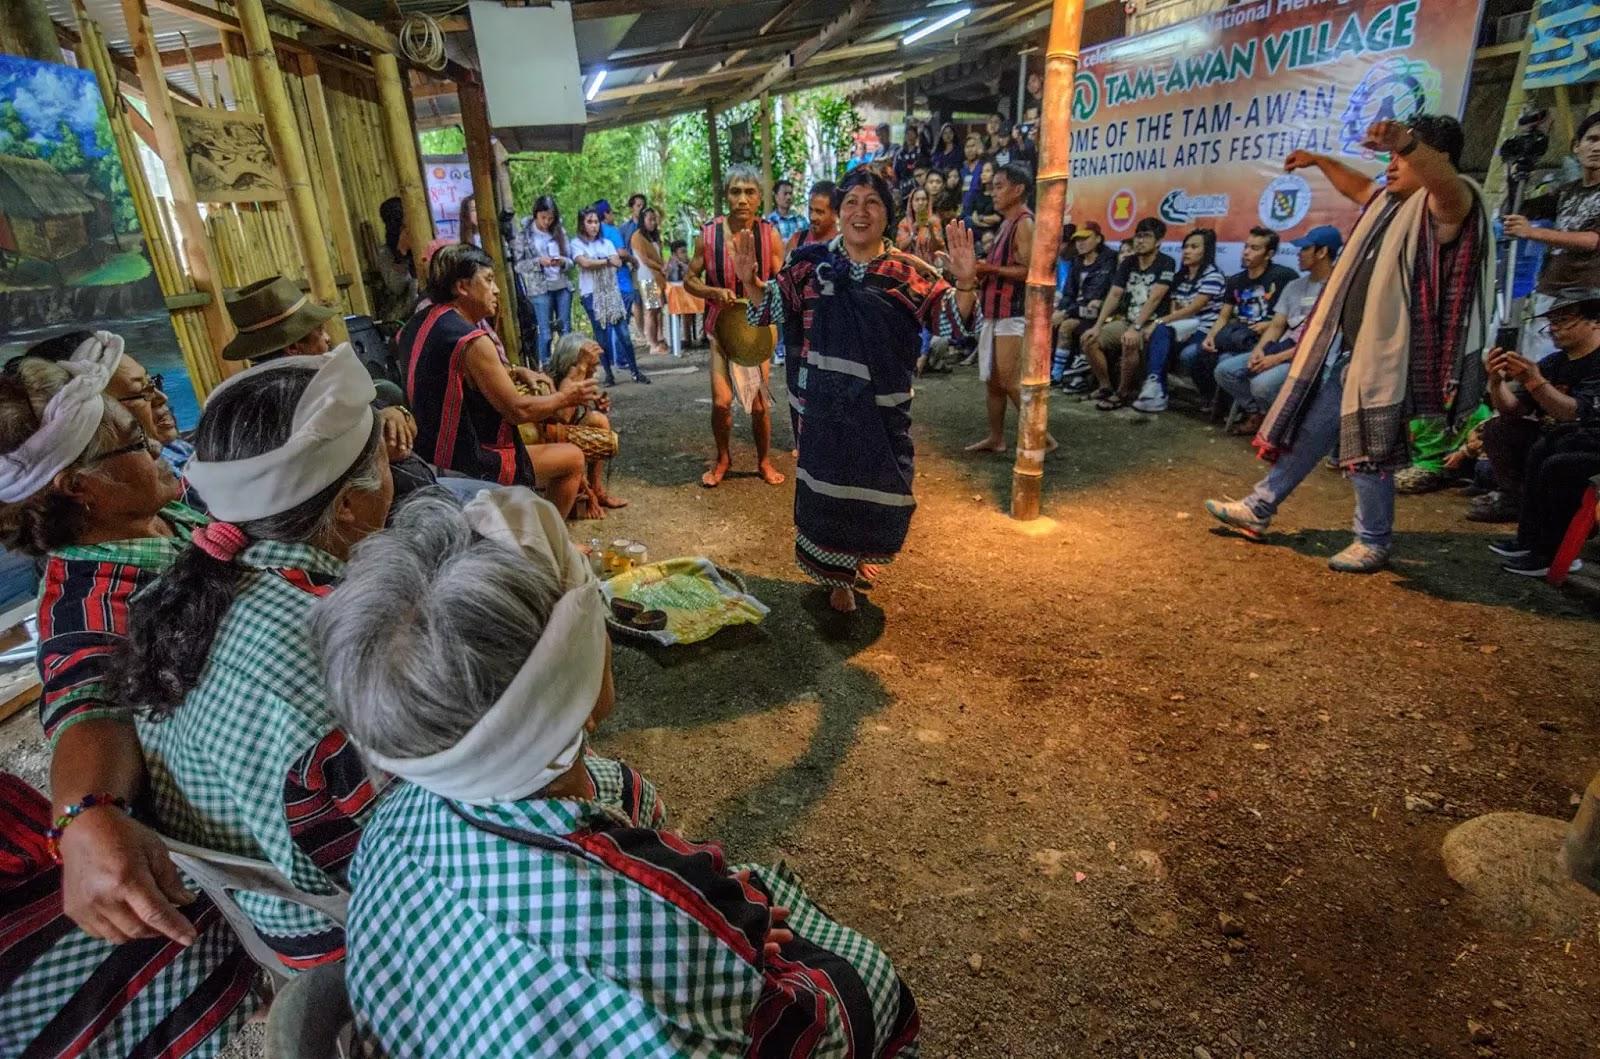 8th Tam-awan International Arts Festival Closing Dance Dance Dance